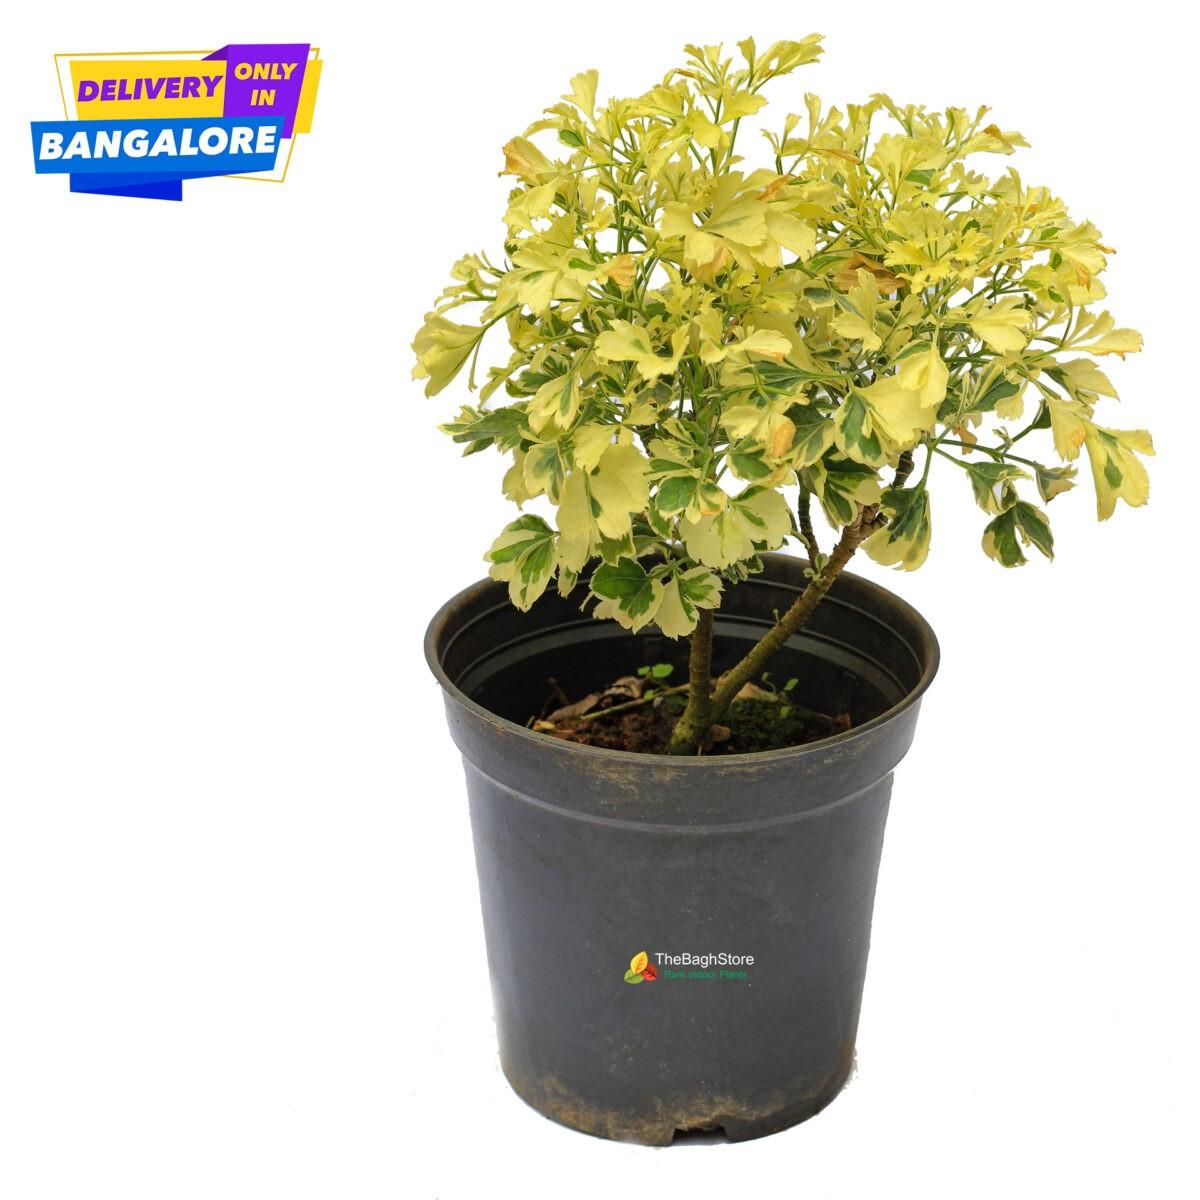 Aralia Indoor Plant Bangalore delivery bright indirect sunshine